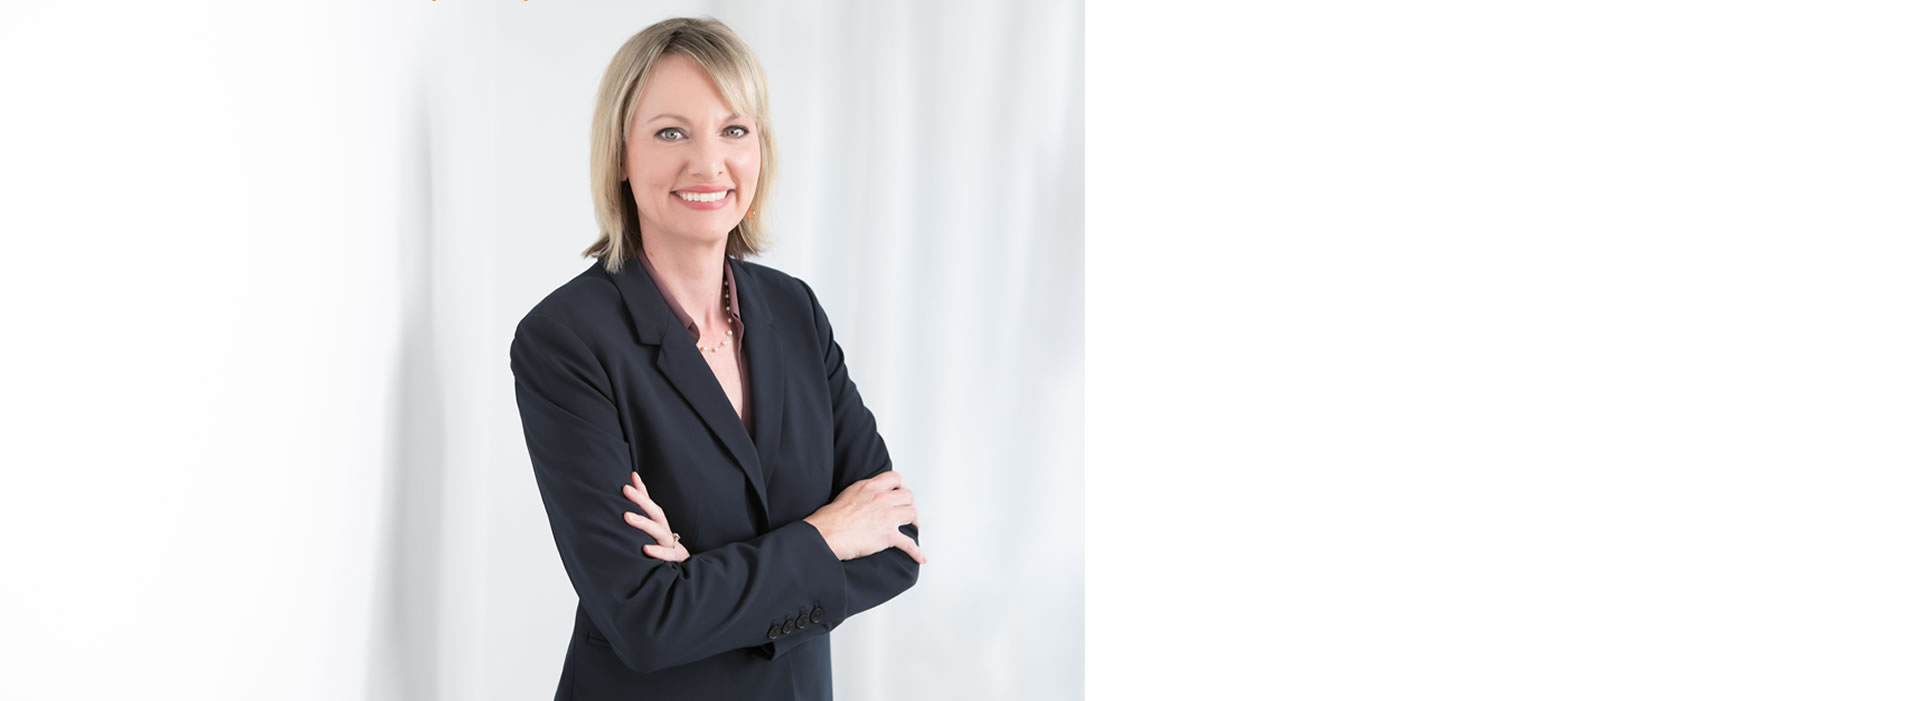 Jacksonville Business Broker Bianca Evans